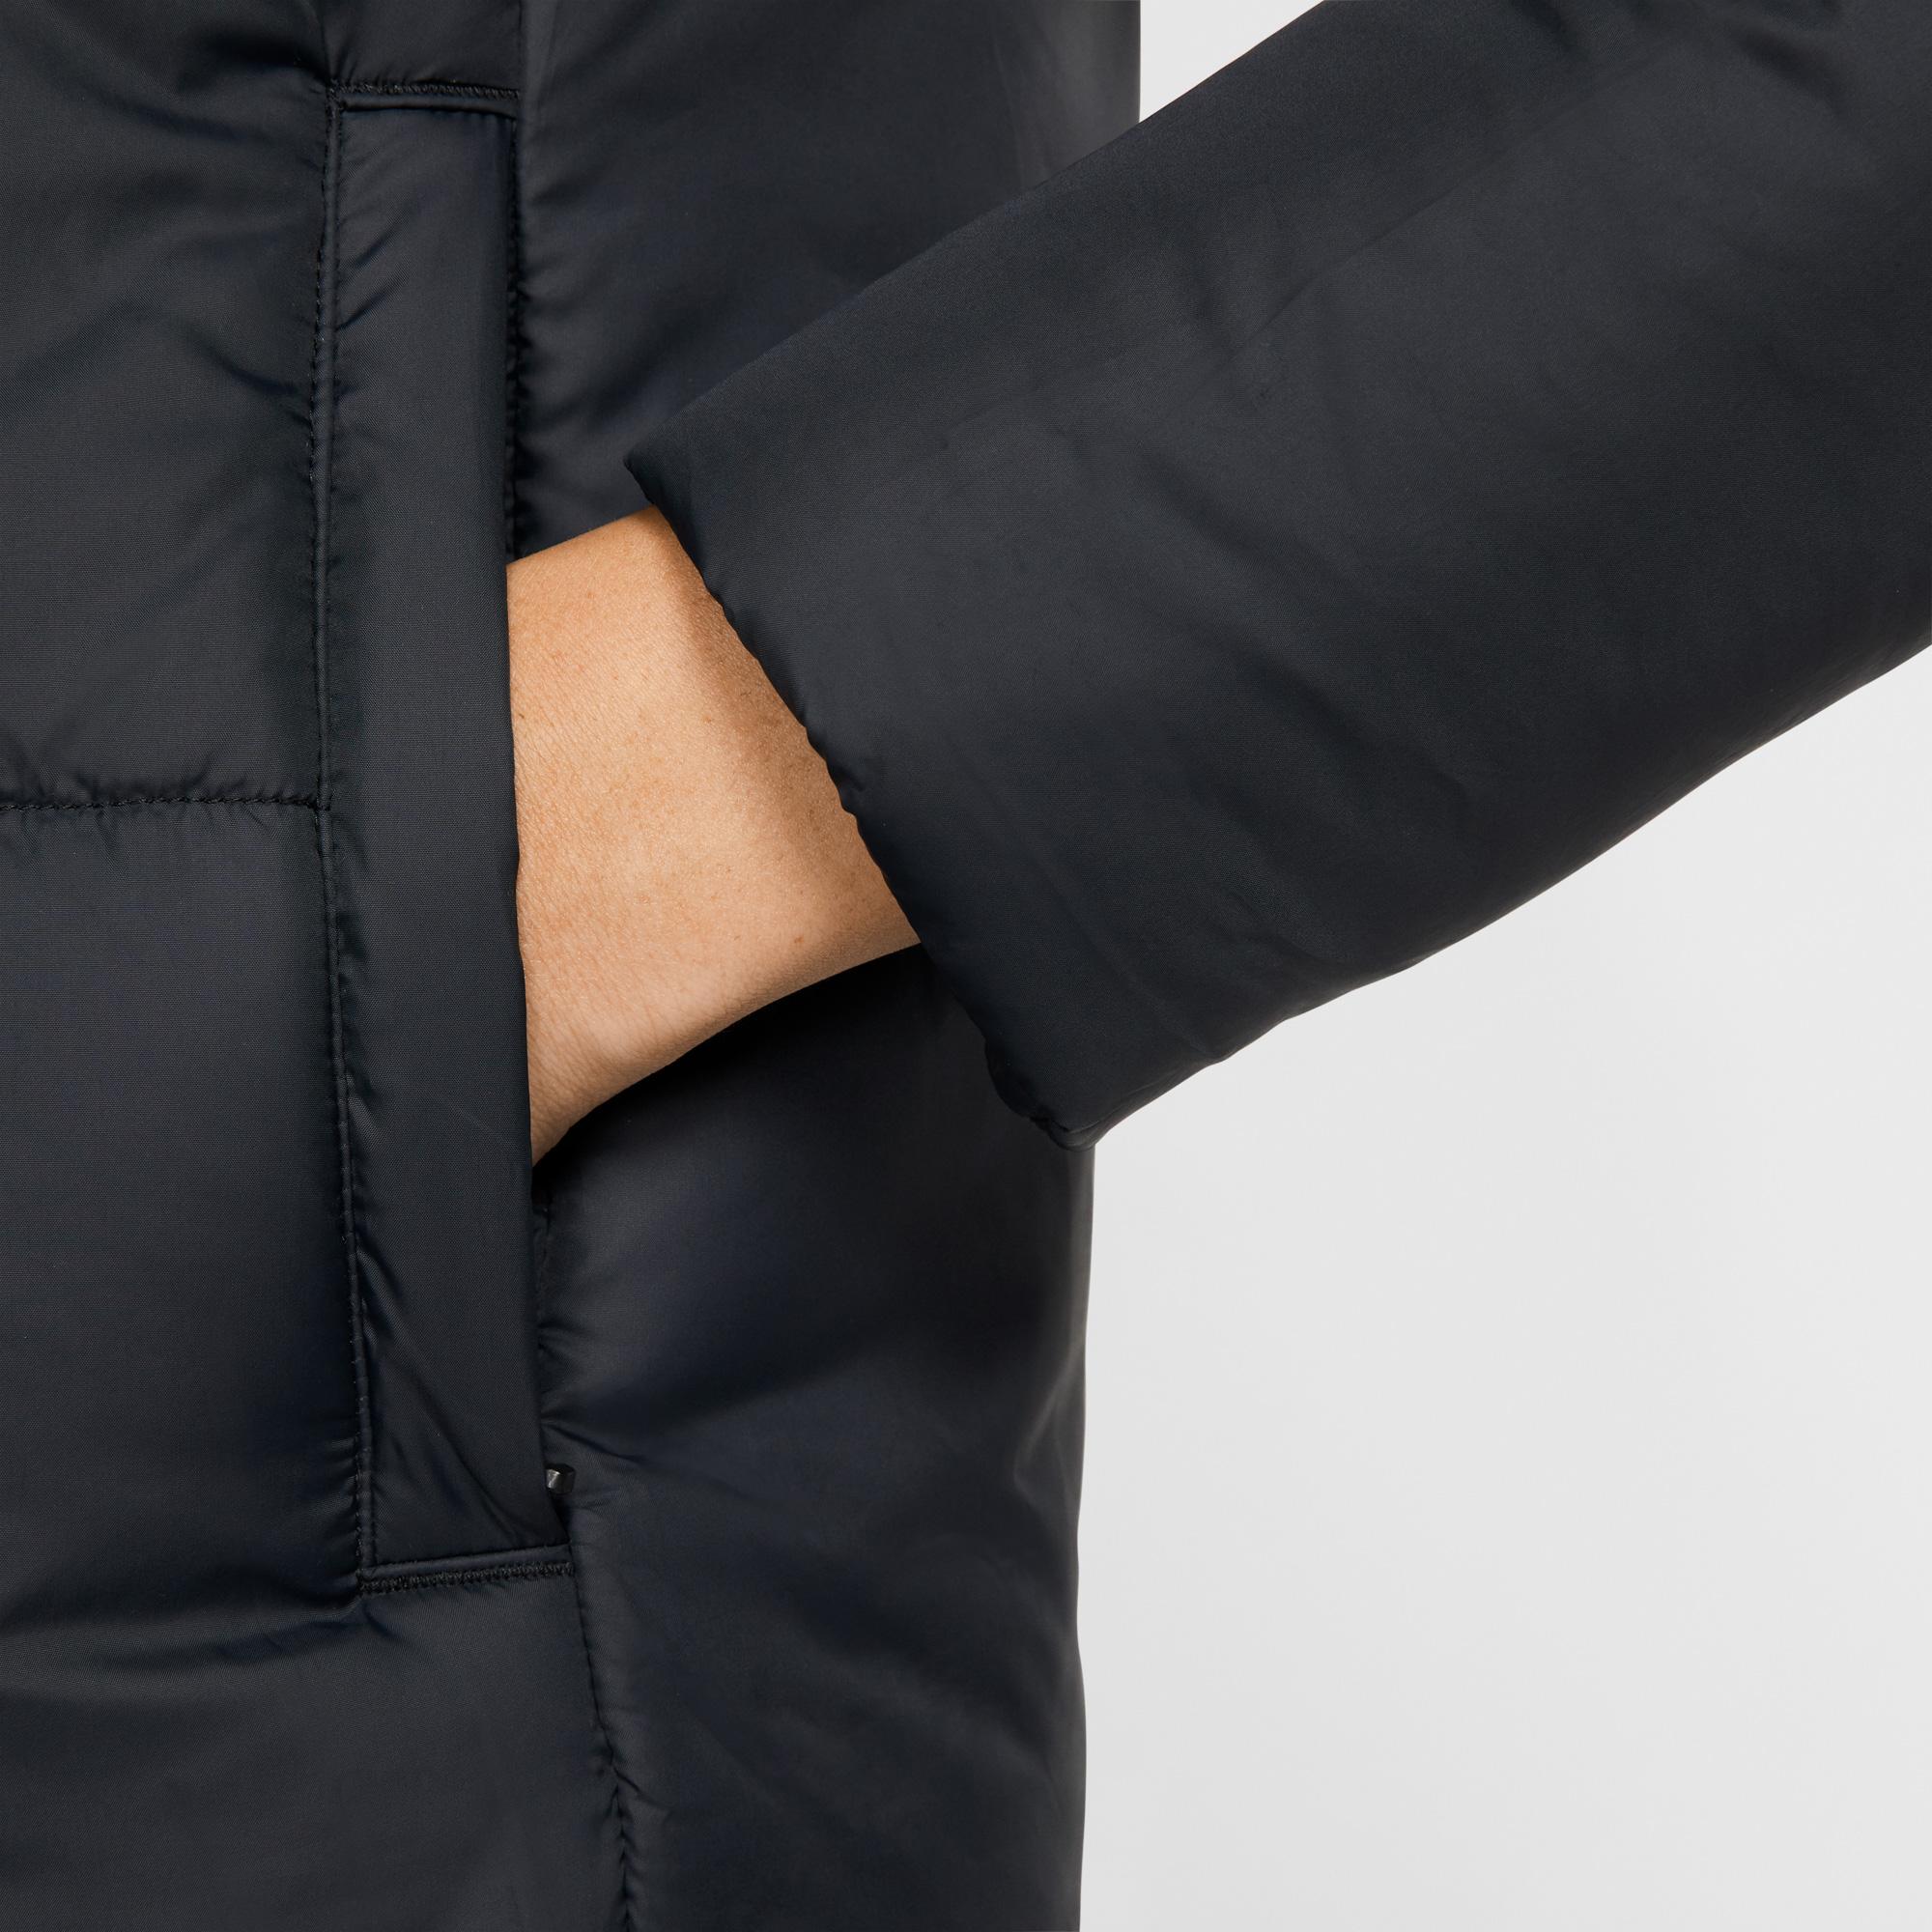 Nike Sportswear Kadın Siyah Mont